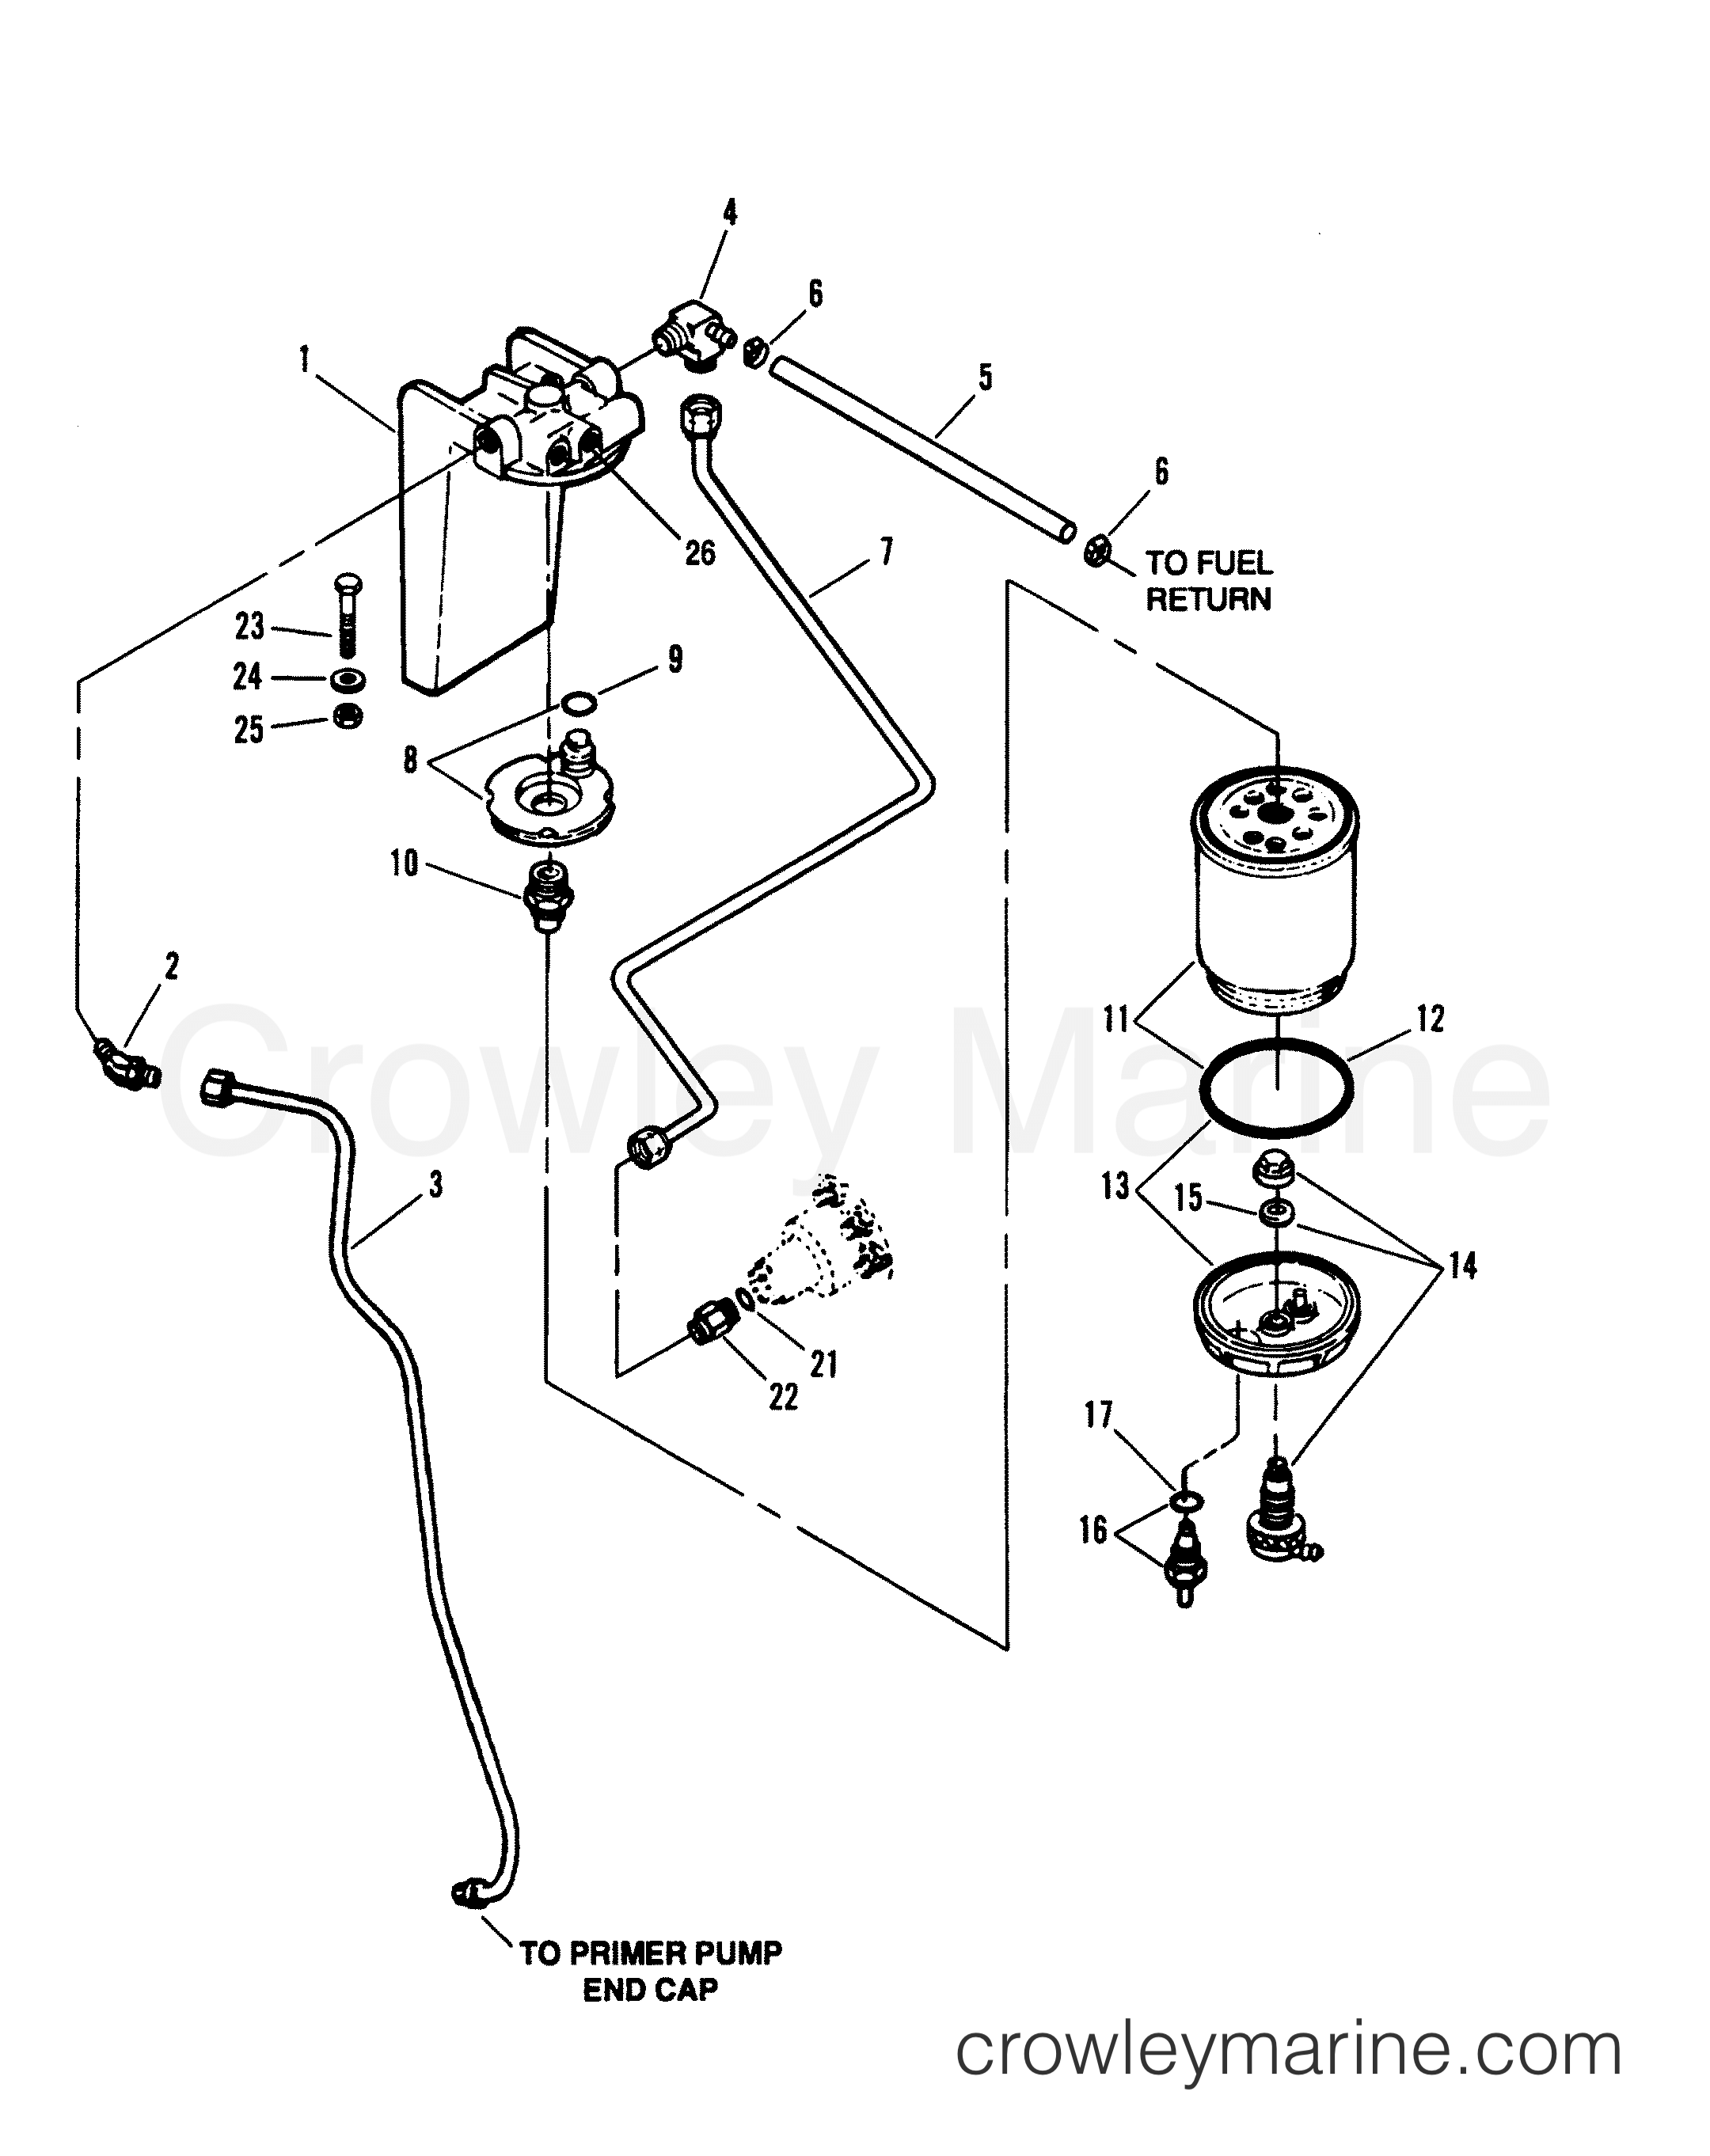 1994 mercruiser 7 3l [bravo] - 473b1f0gs - fuel filter and bracket (inboard